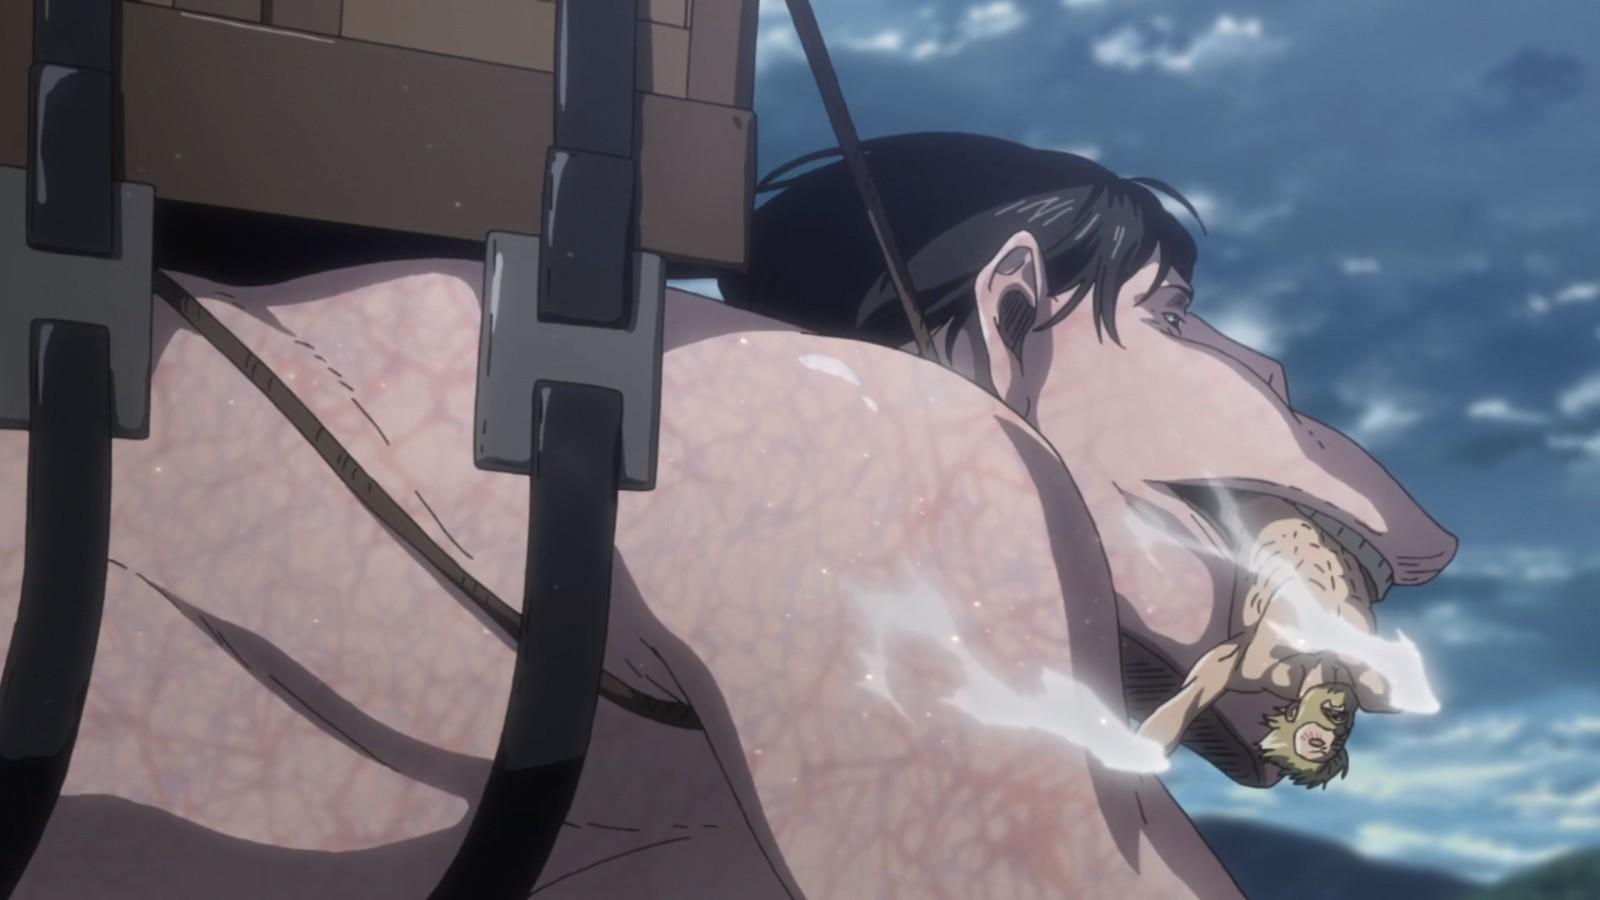 Mengenal Lebih Dekat Sembilan Titan di Shingeki No Kyojin 7